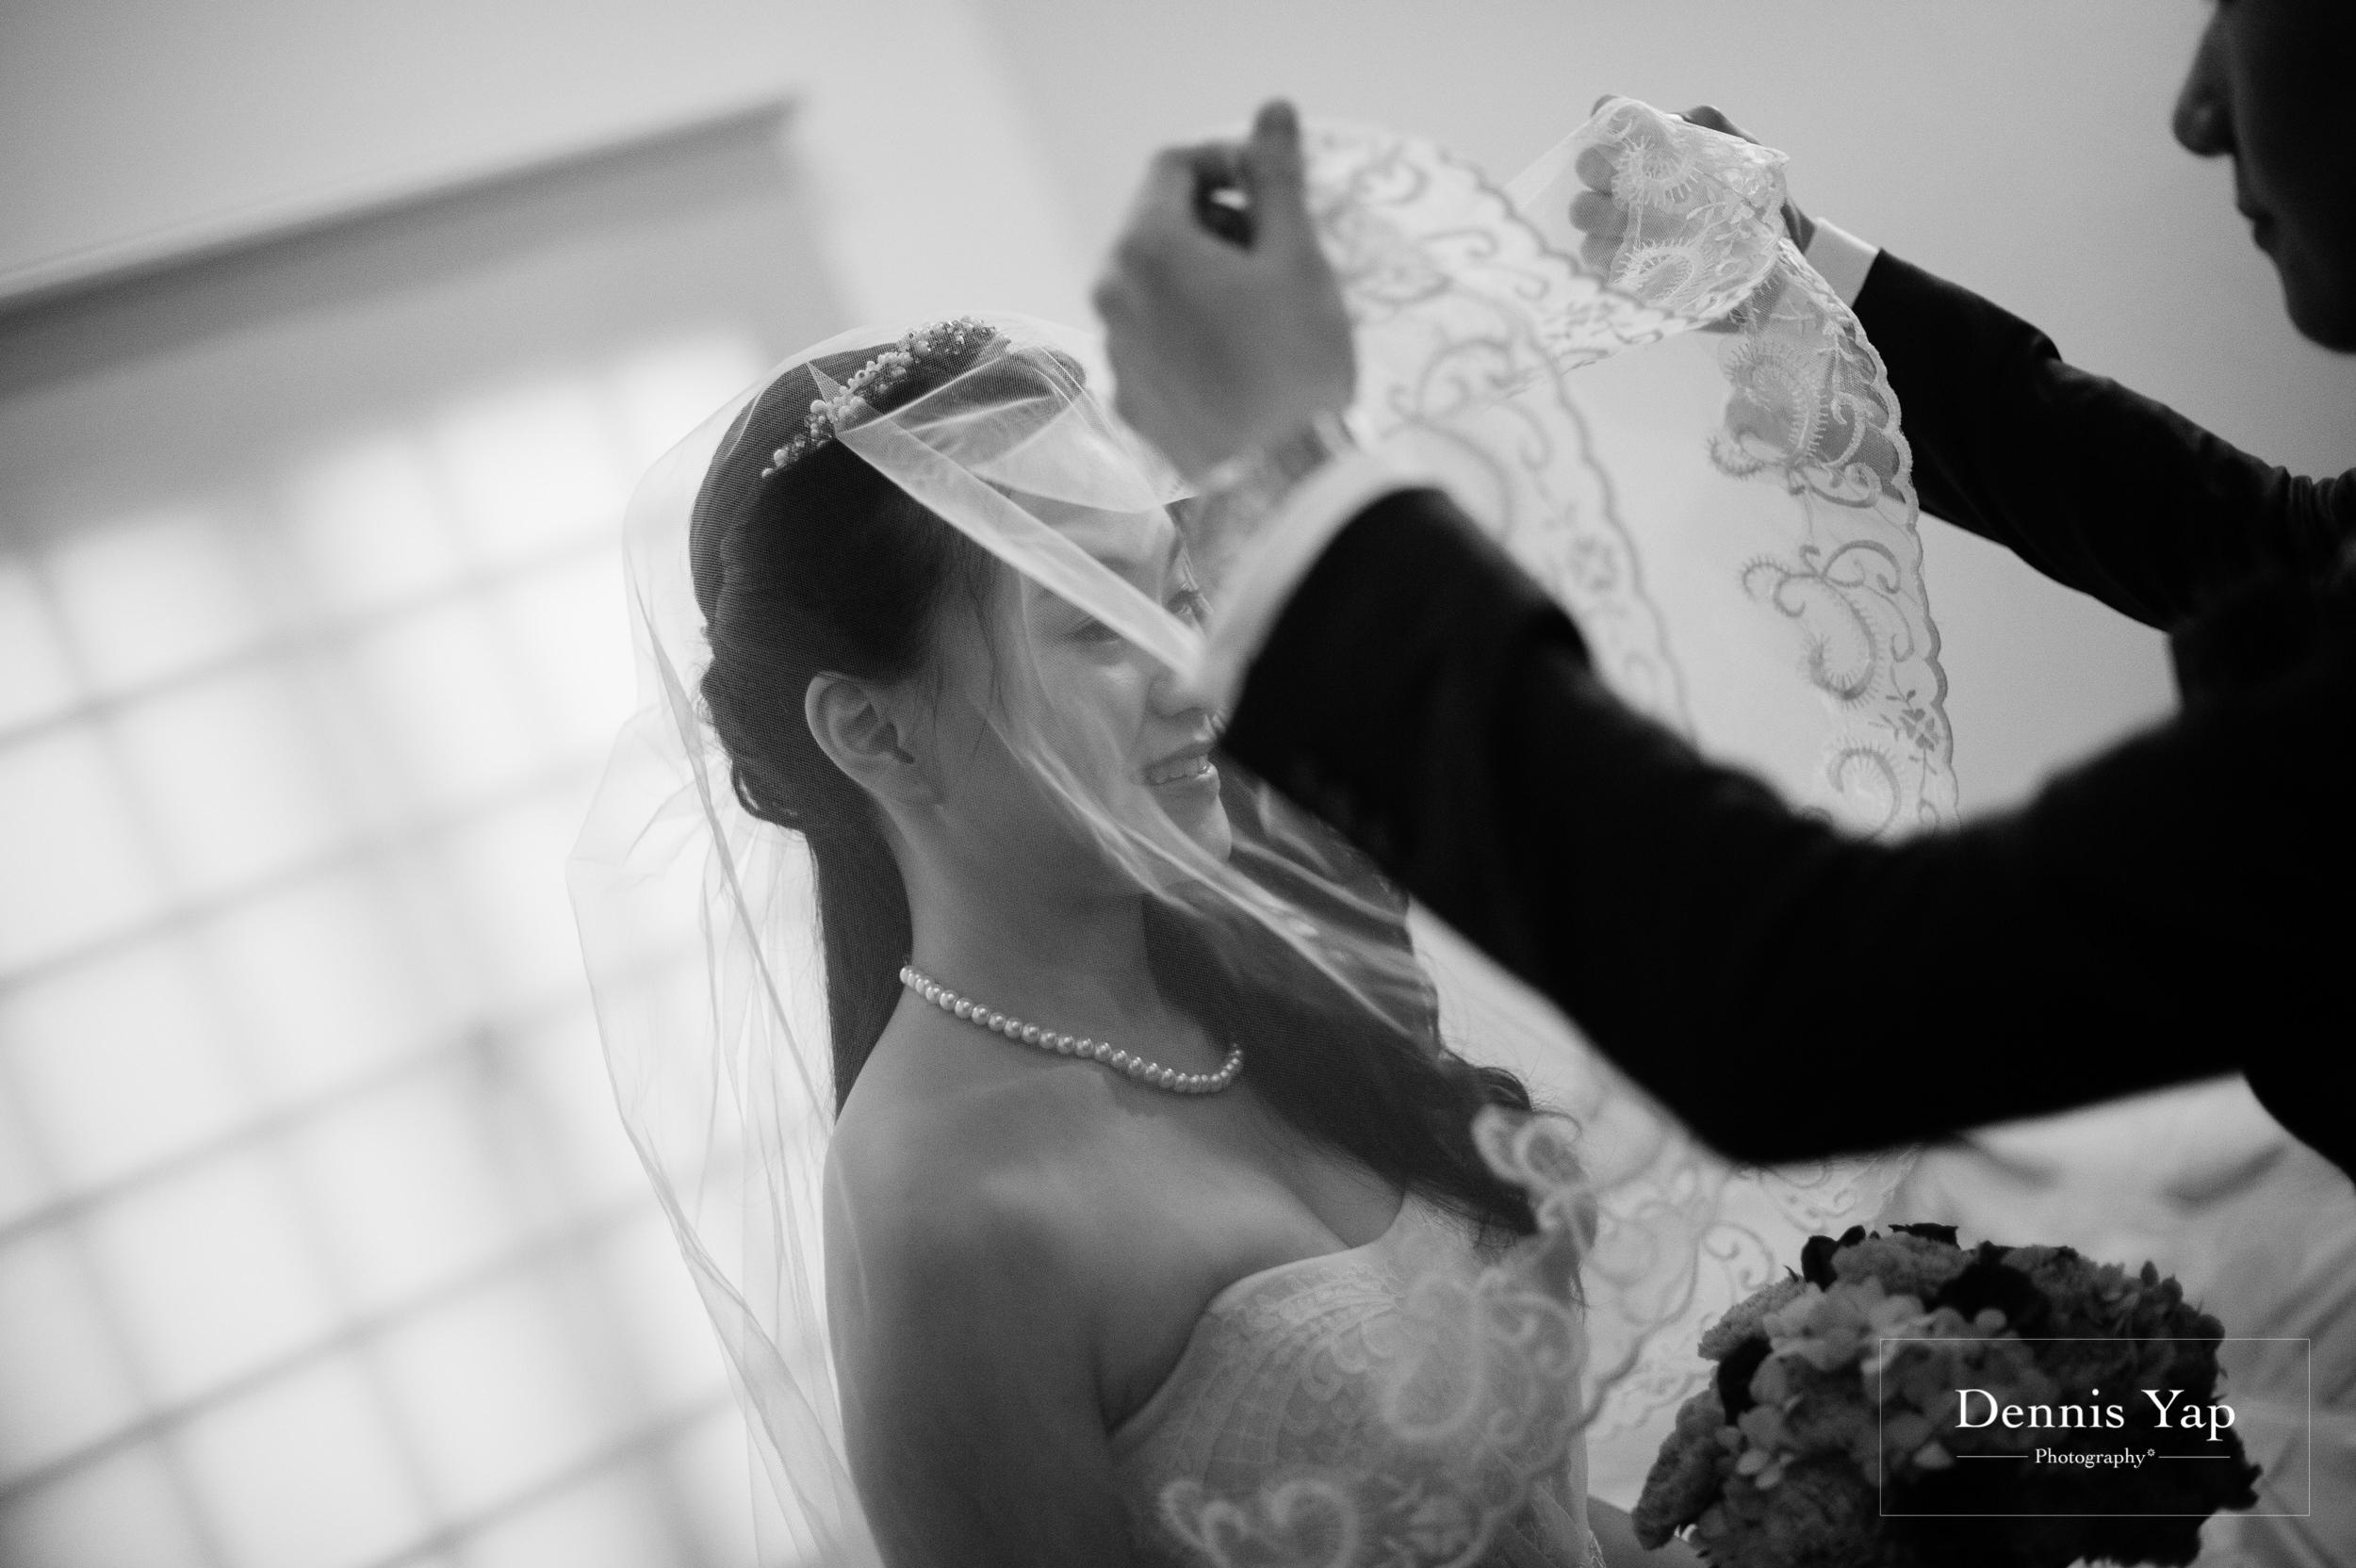 ethan juli wedding day gate crash wedding party dennis yap photography colors-30.jpg